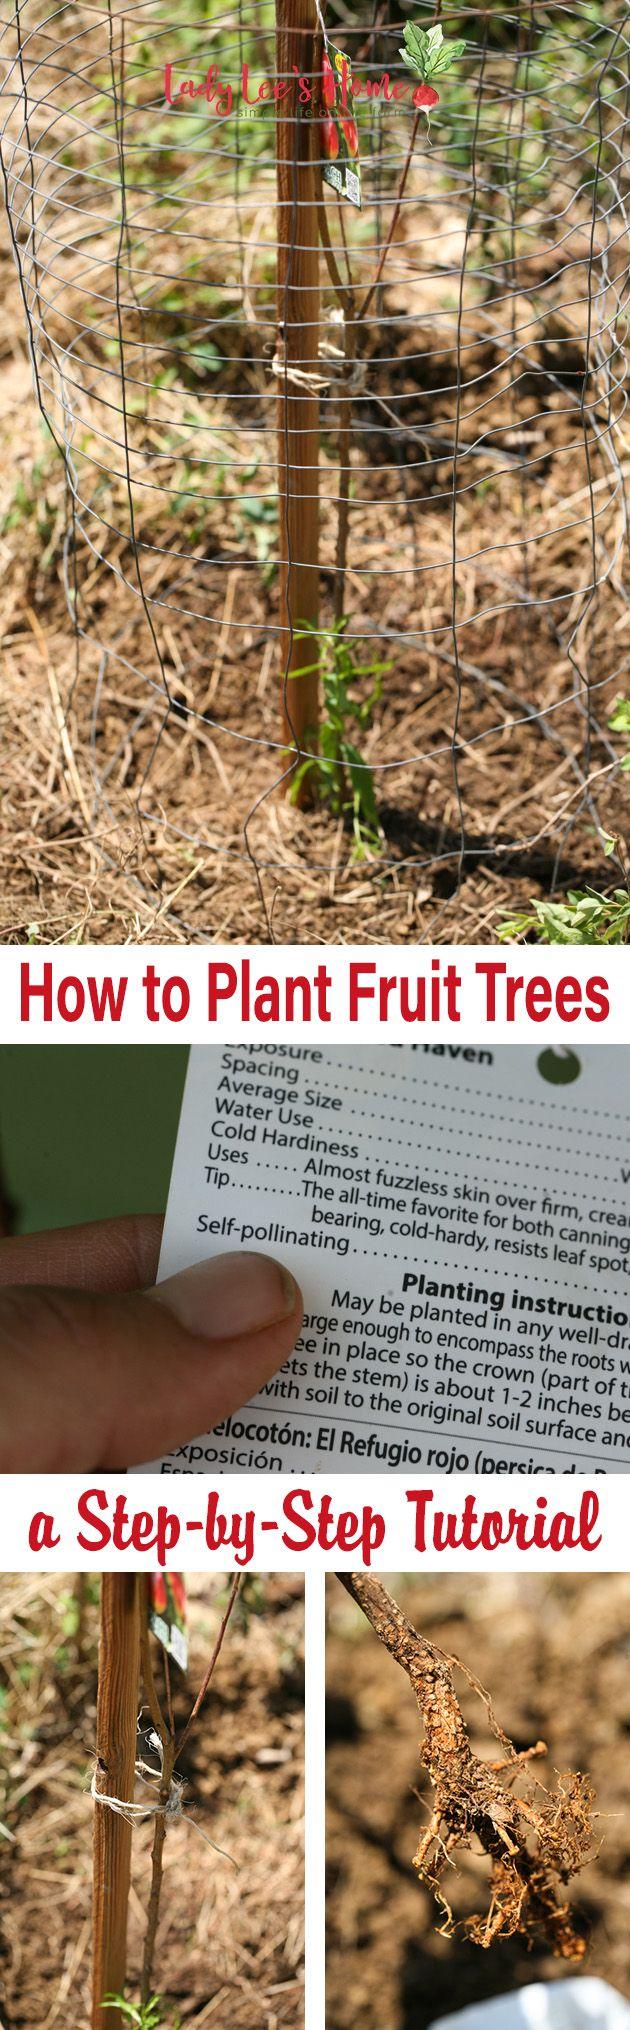 How To Plant Bare Root Fruit Trees Fruit Trees Planting Fruit Trees Fruit Garden